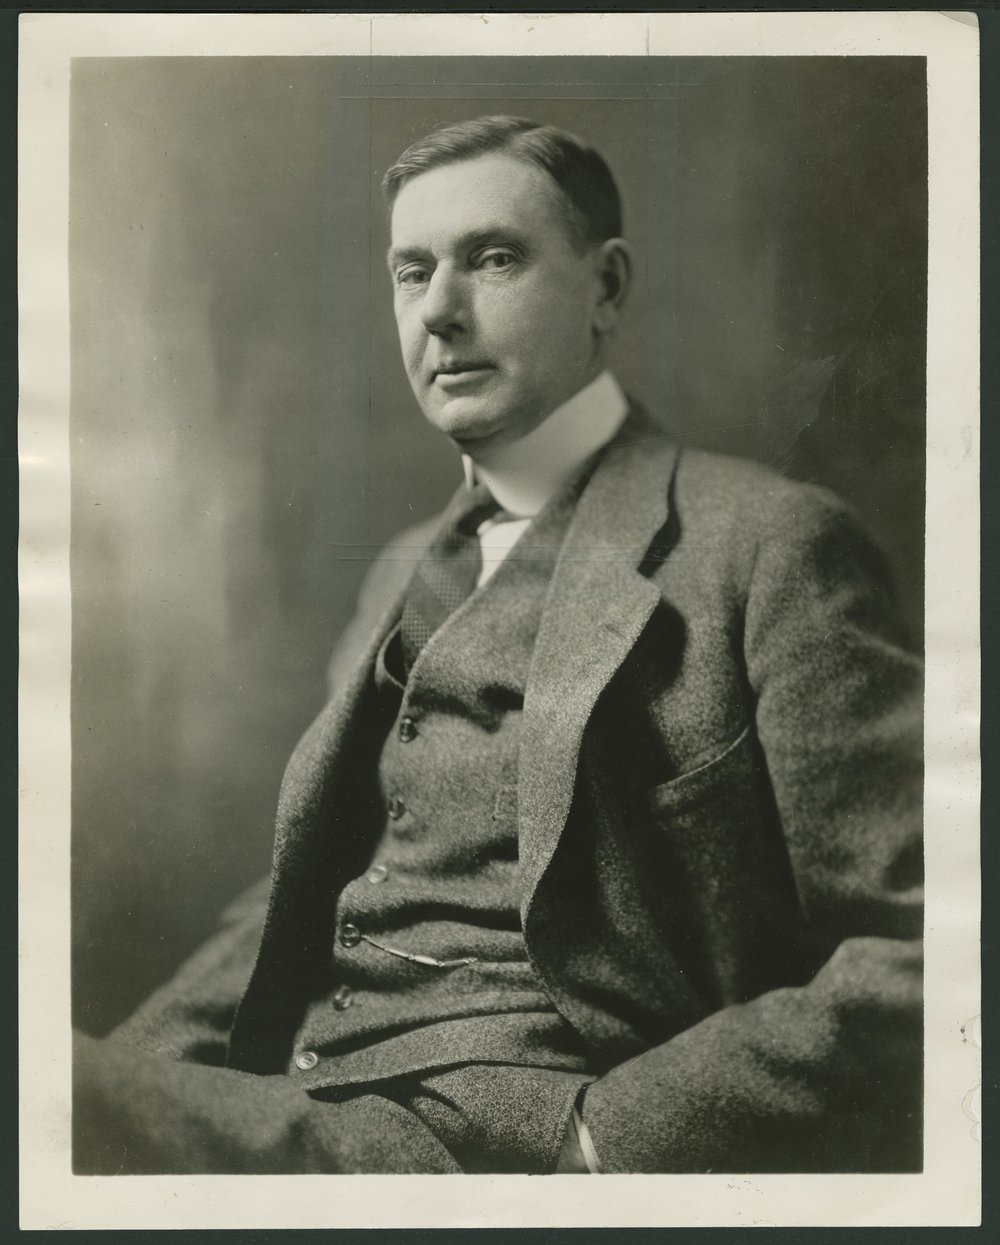 Dr. Elmer Verner McCollum - 1